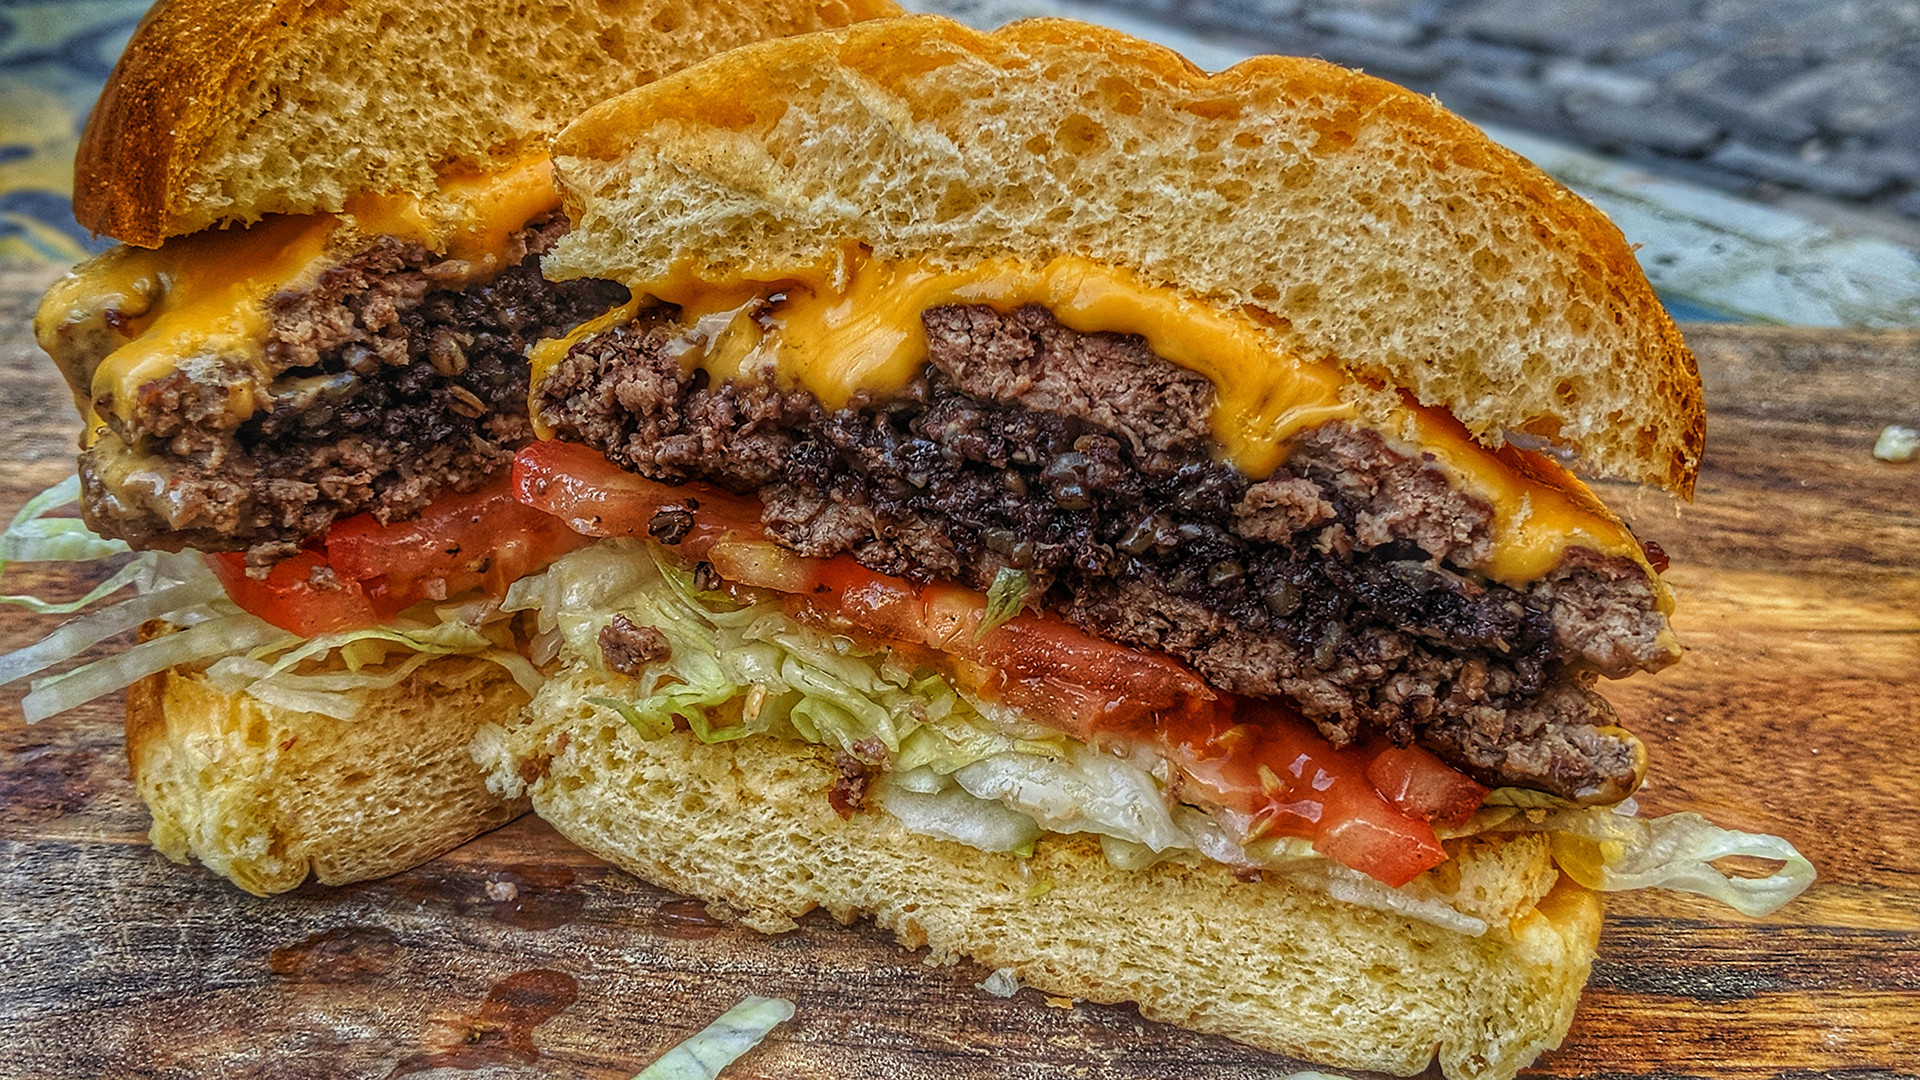 Burger Boy's Clonakilty Blackpudding burger